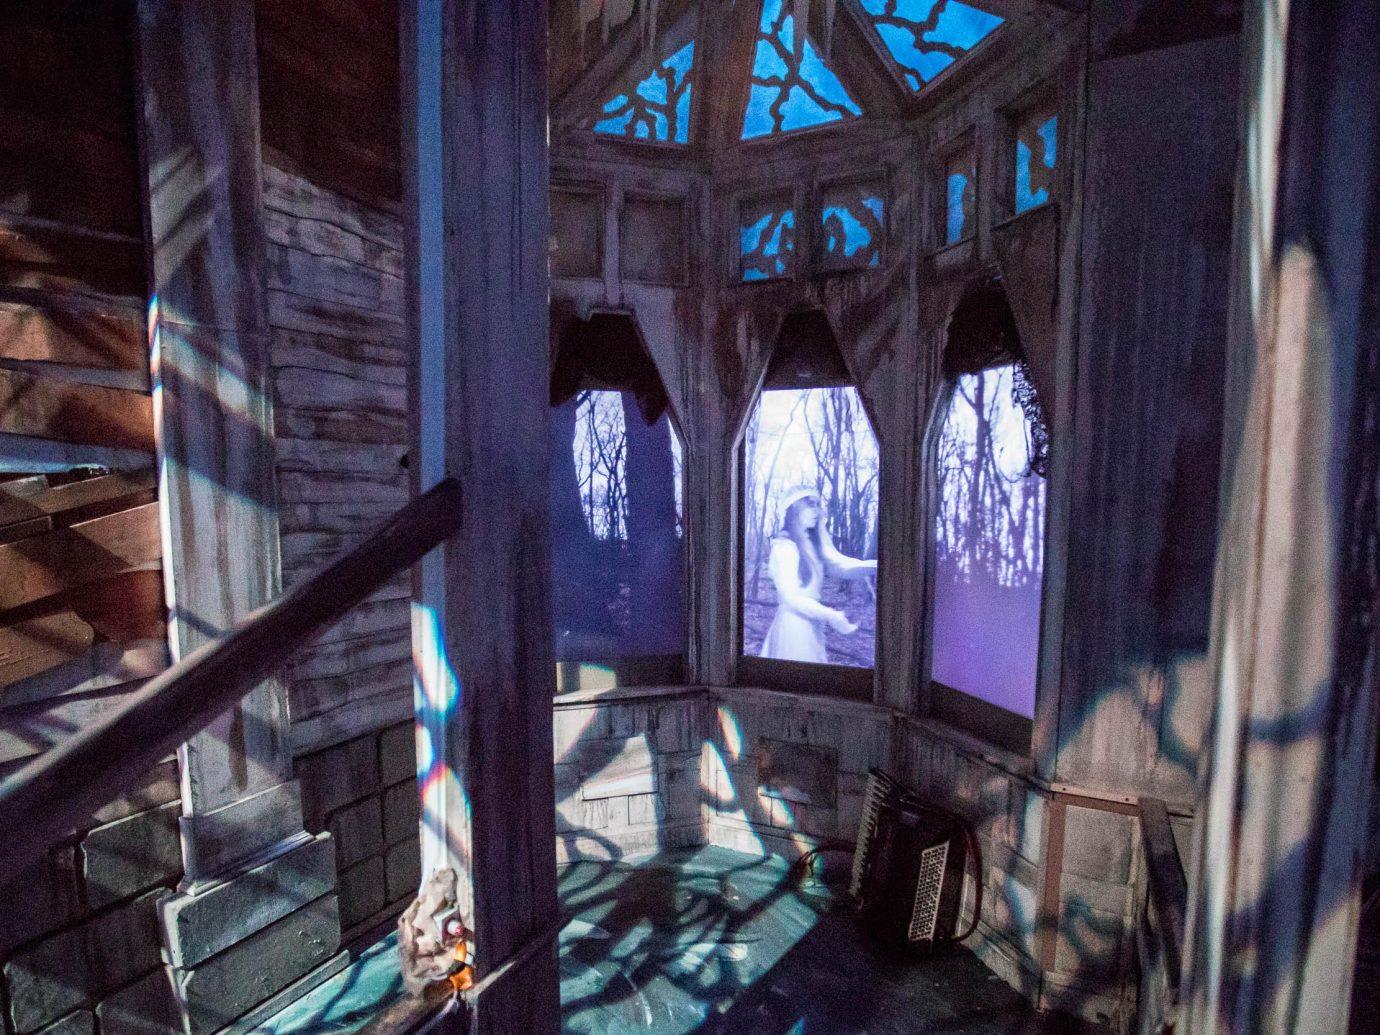 The Gravesend Inn, A Haunted Hotel